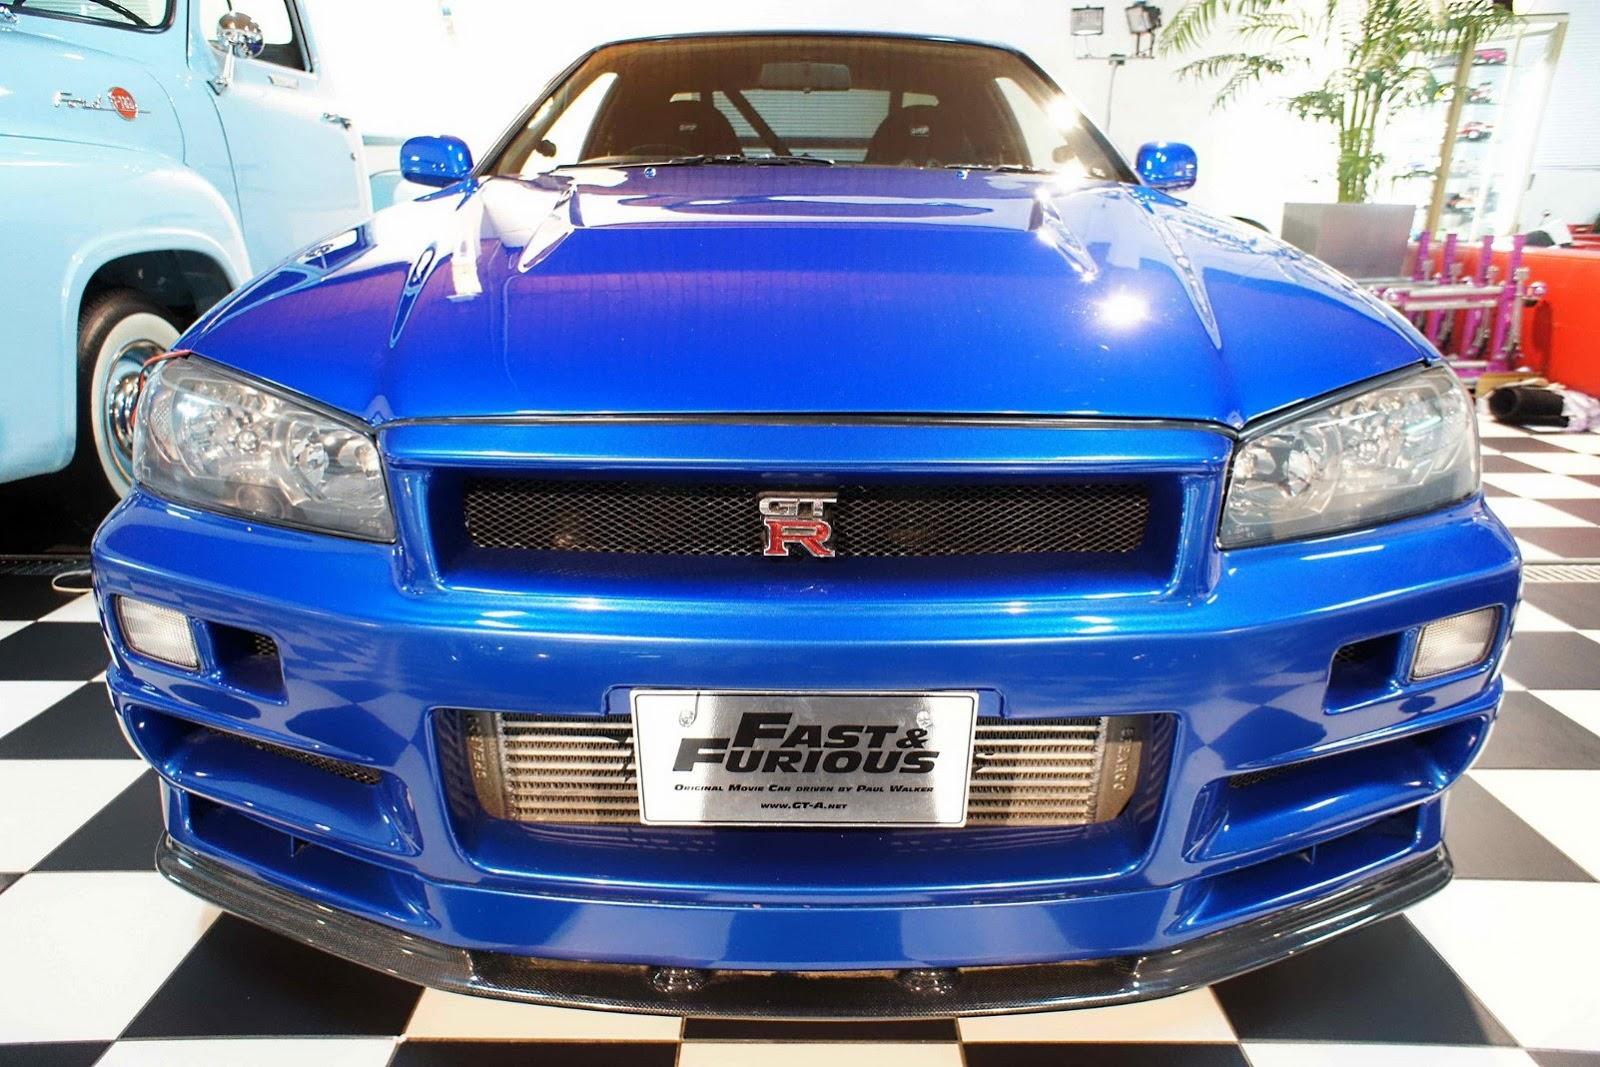 Paul Walker's Fast & Furious R34 Nissan Skyline GT-R front ...